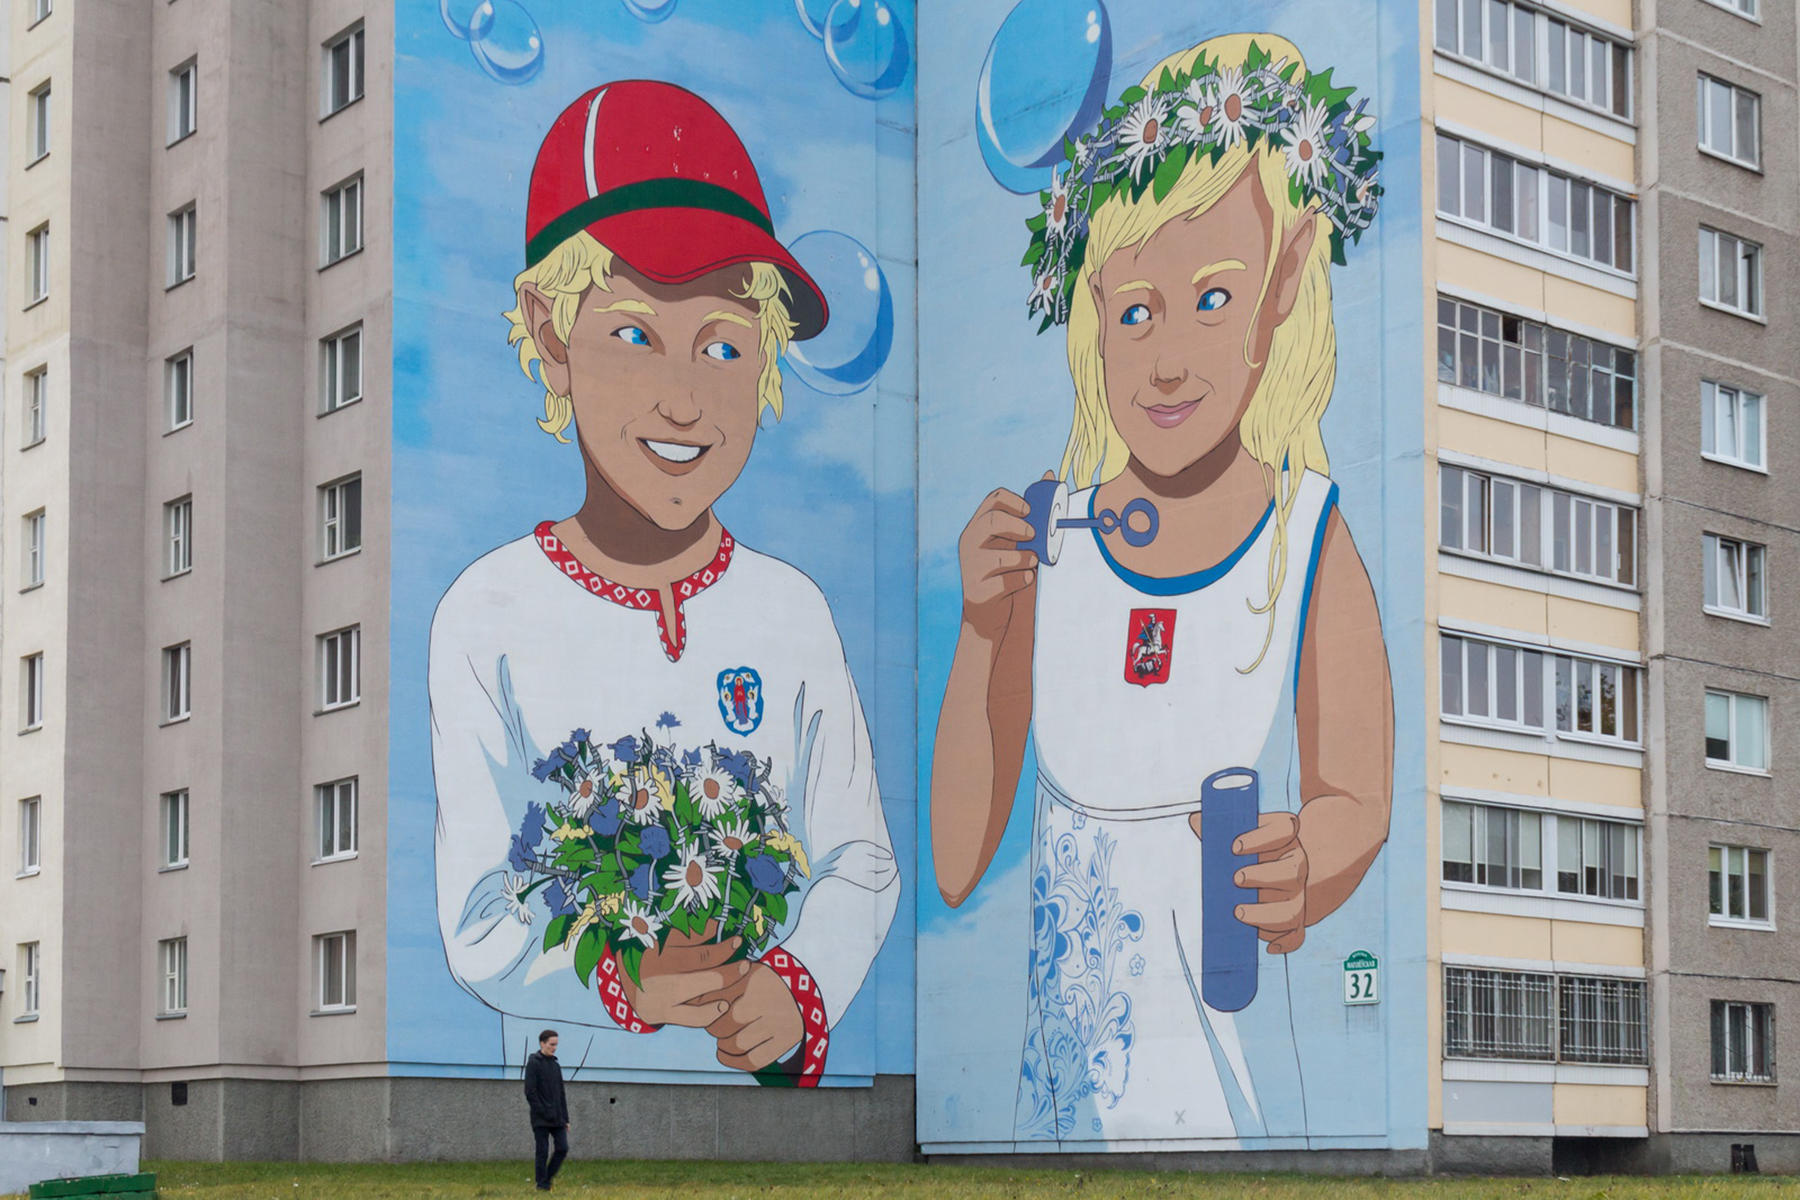 Minsk Moskou graffiti prikkldraad